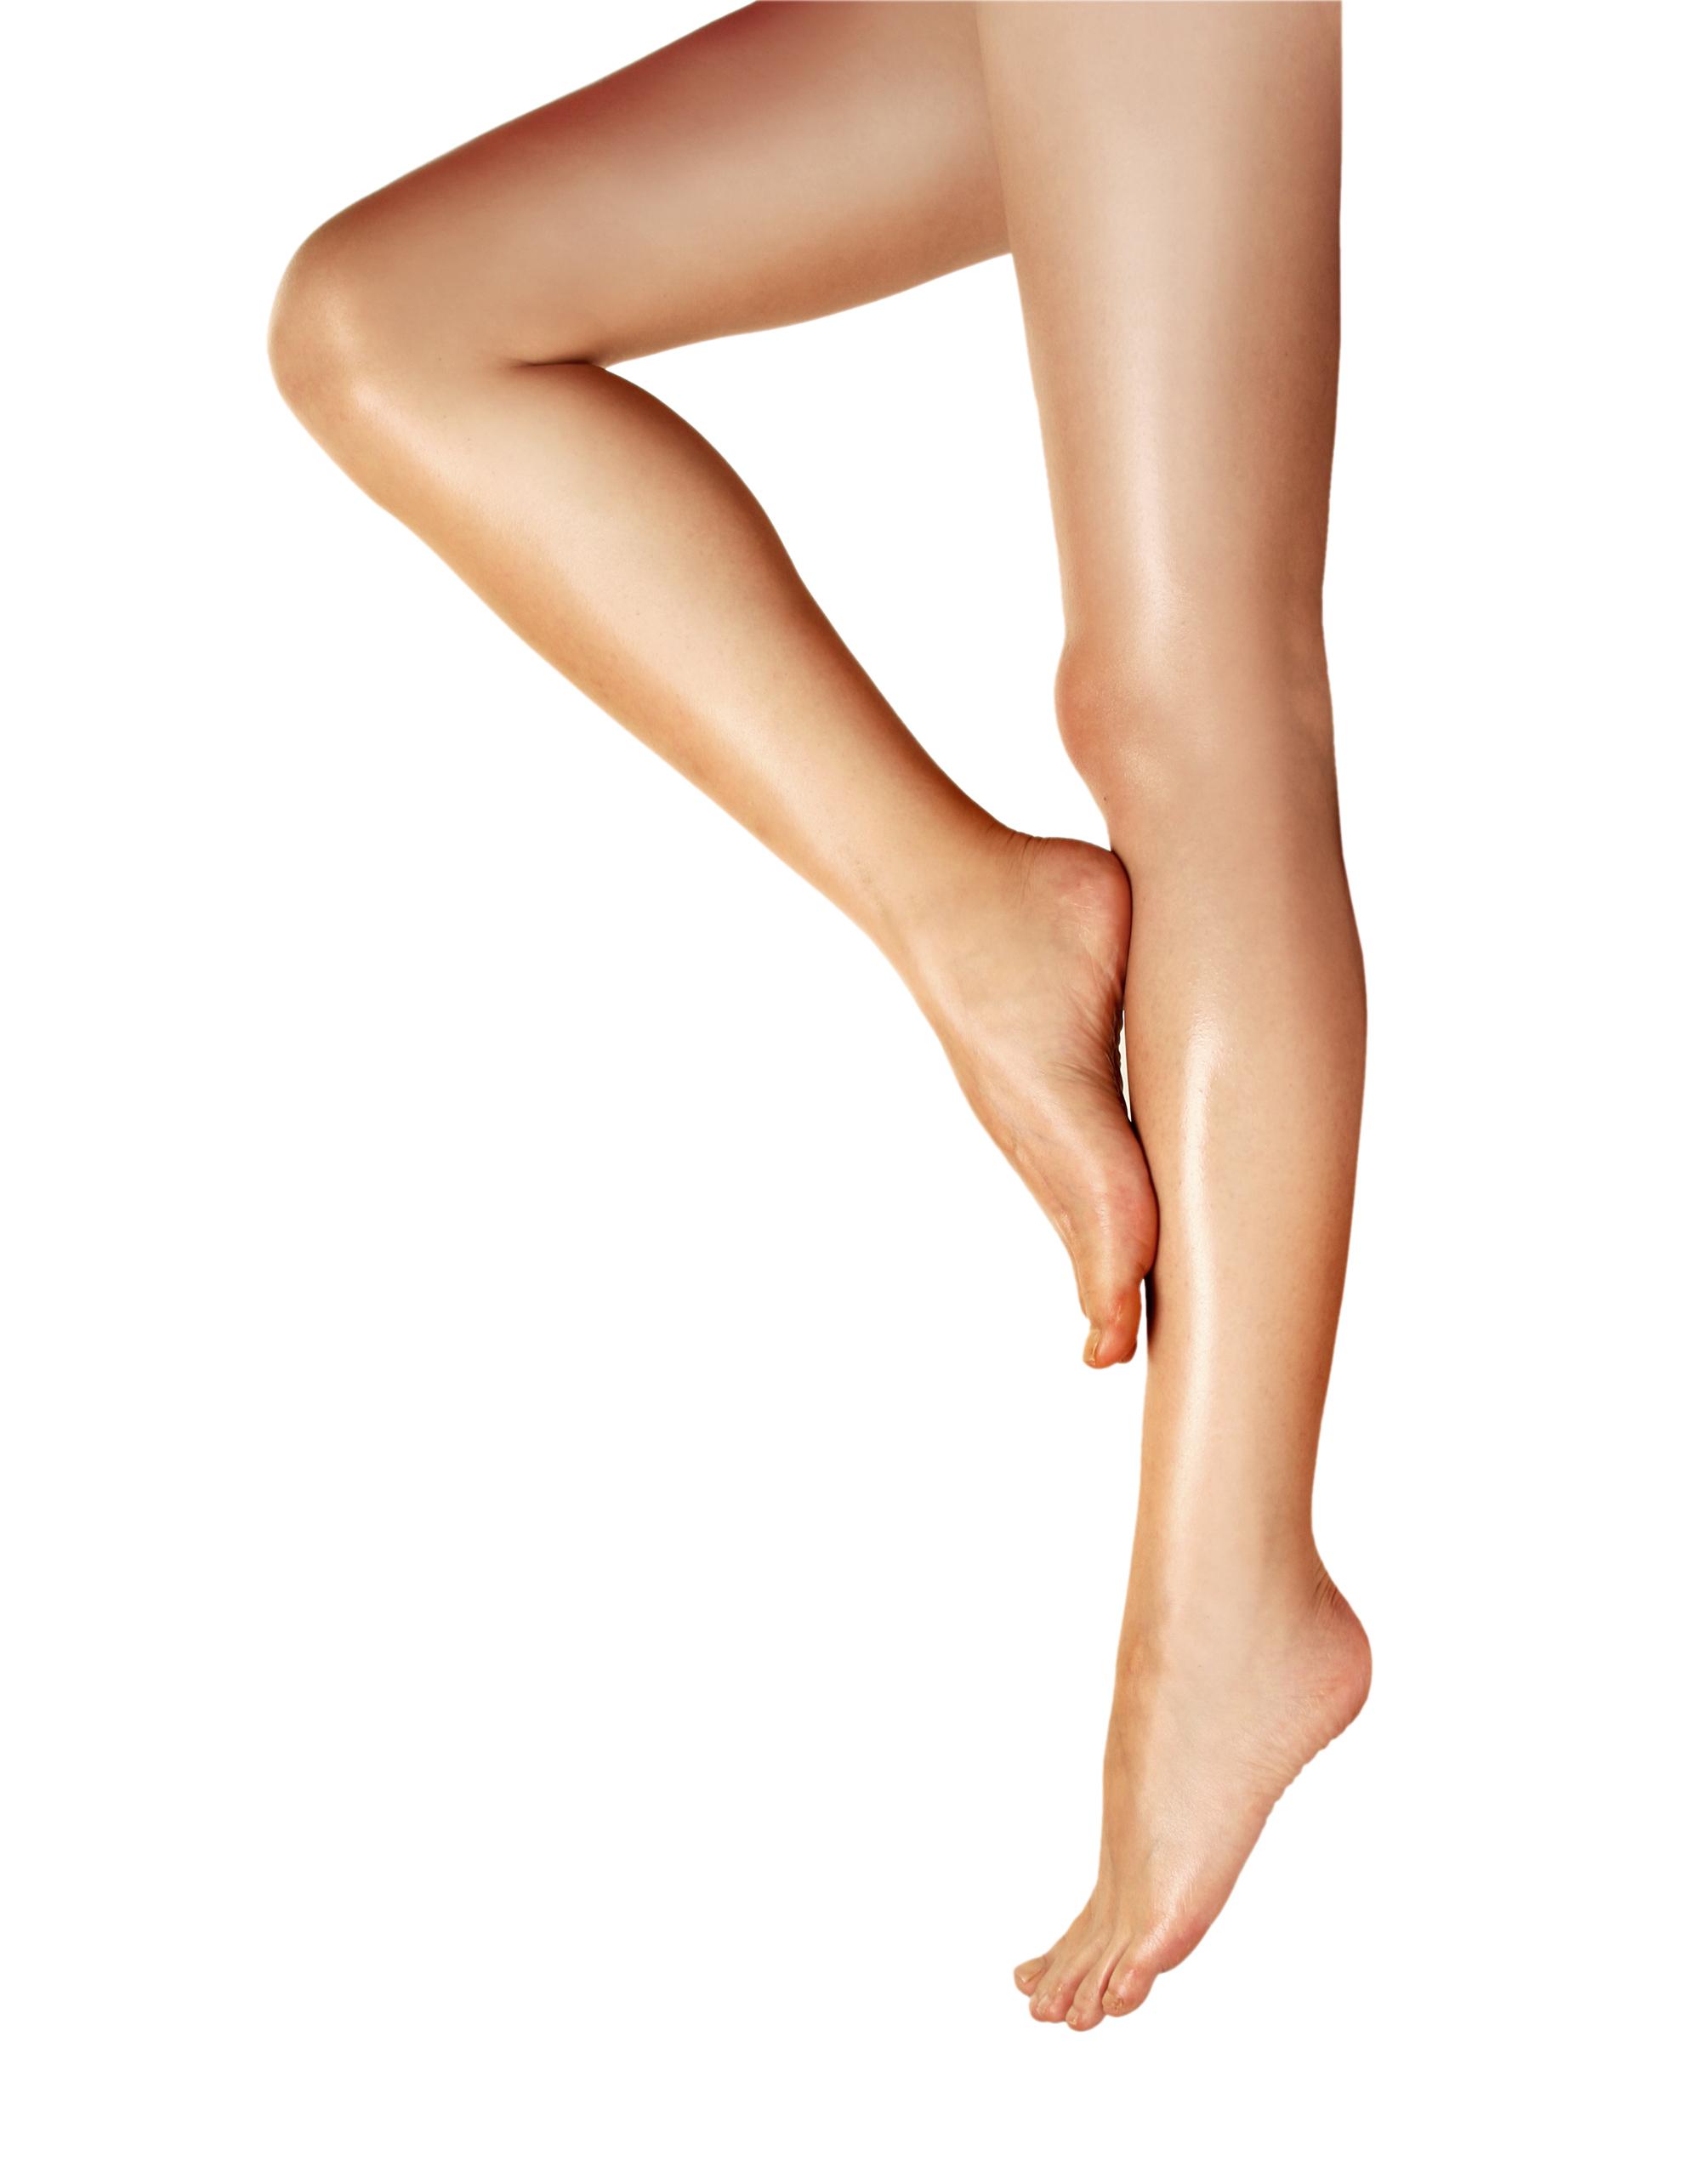 Legs PNG image, leg PNG - Leg PNG